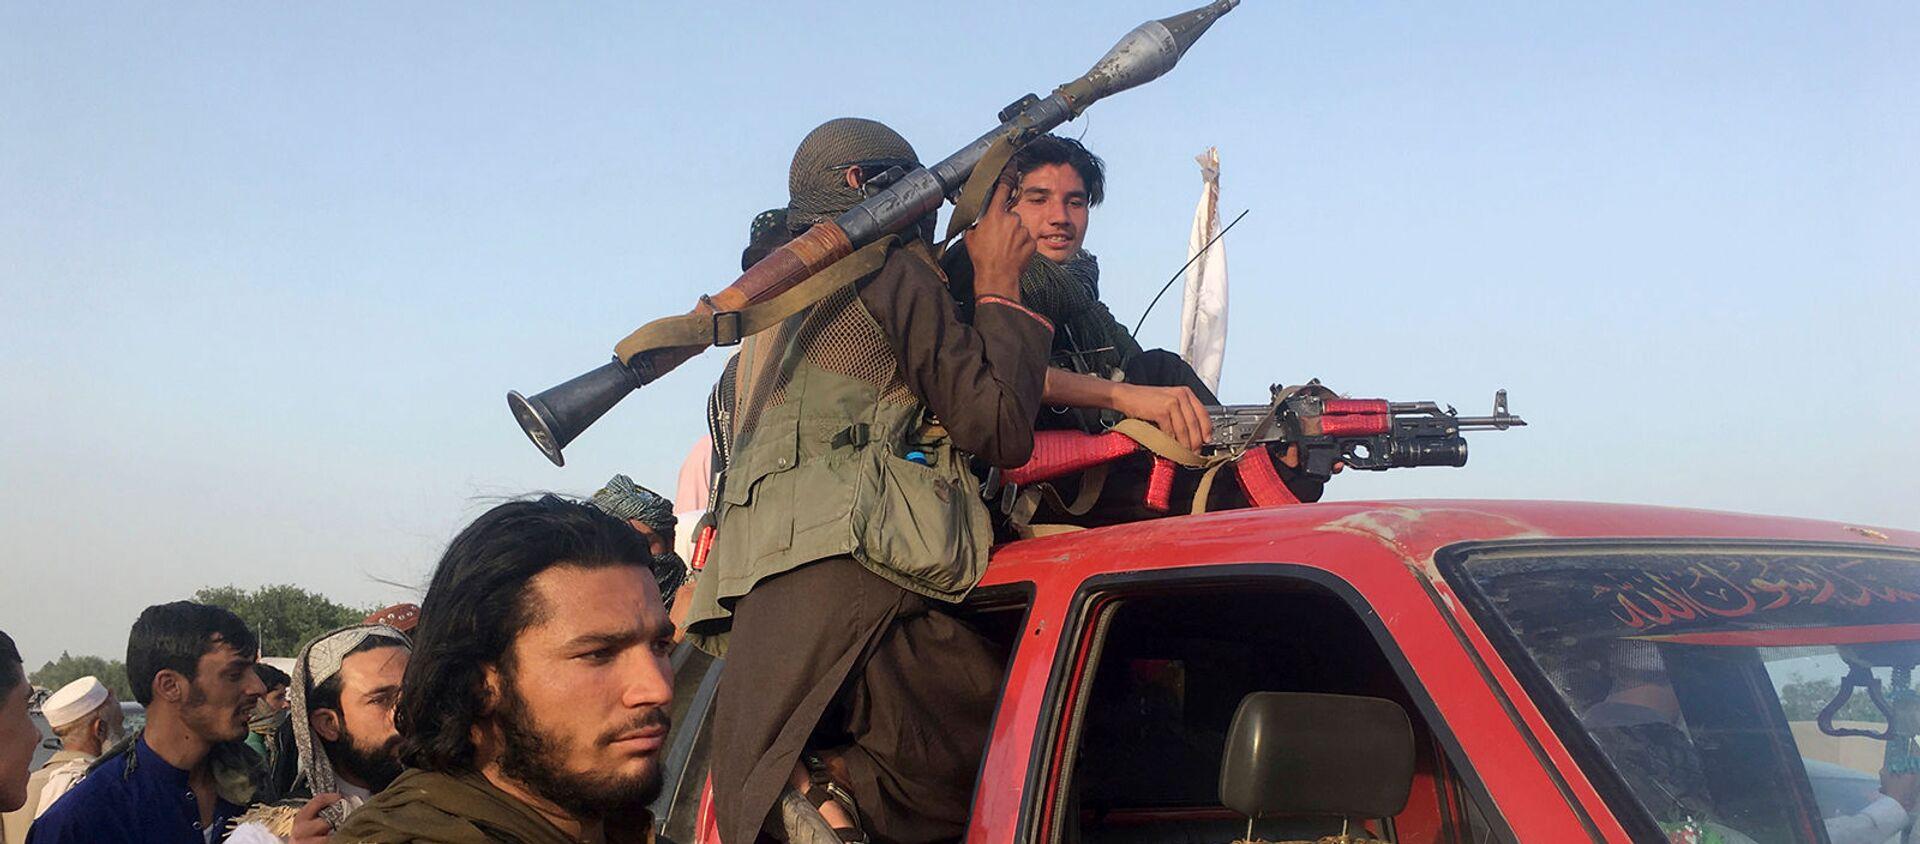 Бойцы Талибан в районе провинции Нангархар, к востоку от Кабула (16 июня 2018). Афганистан - Sputnik Արմենիա, 1920, 15.07.2021